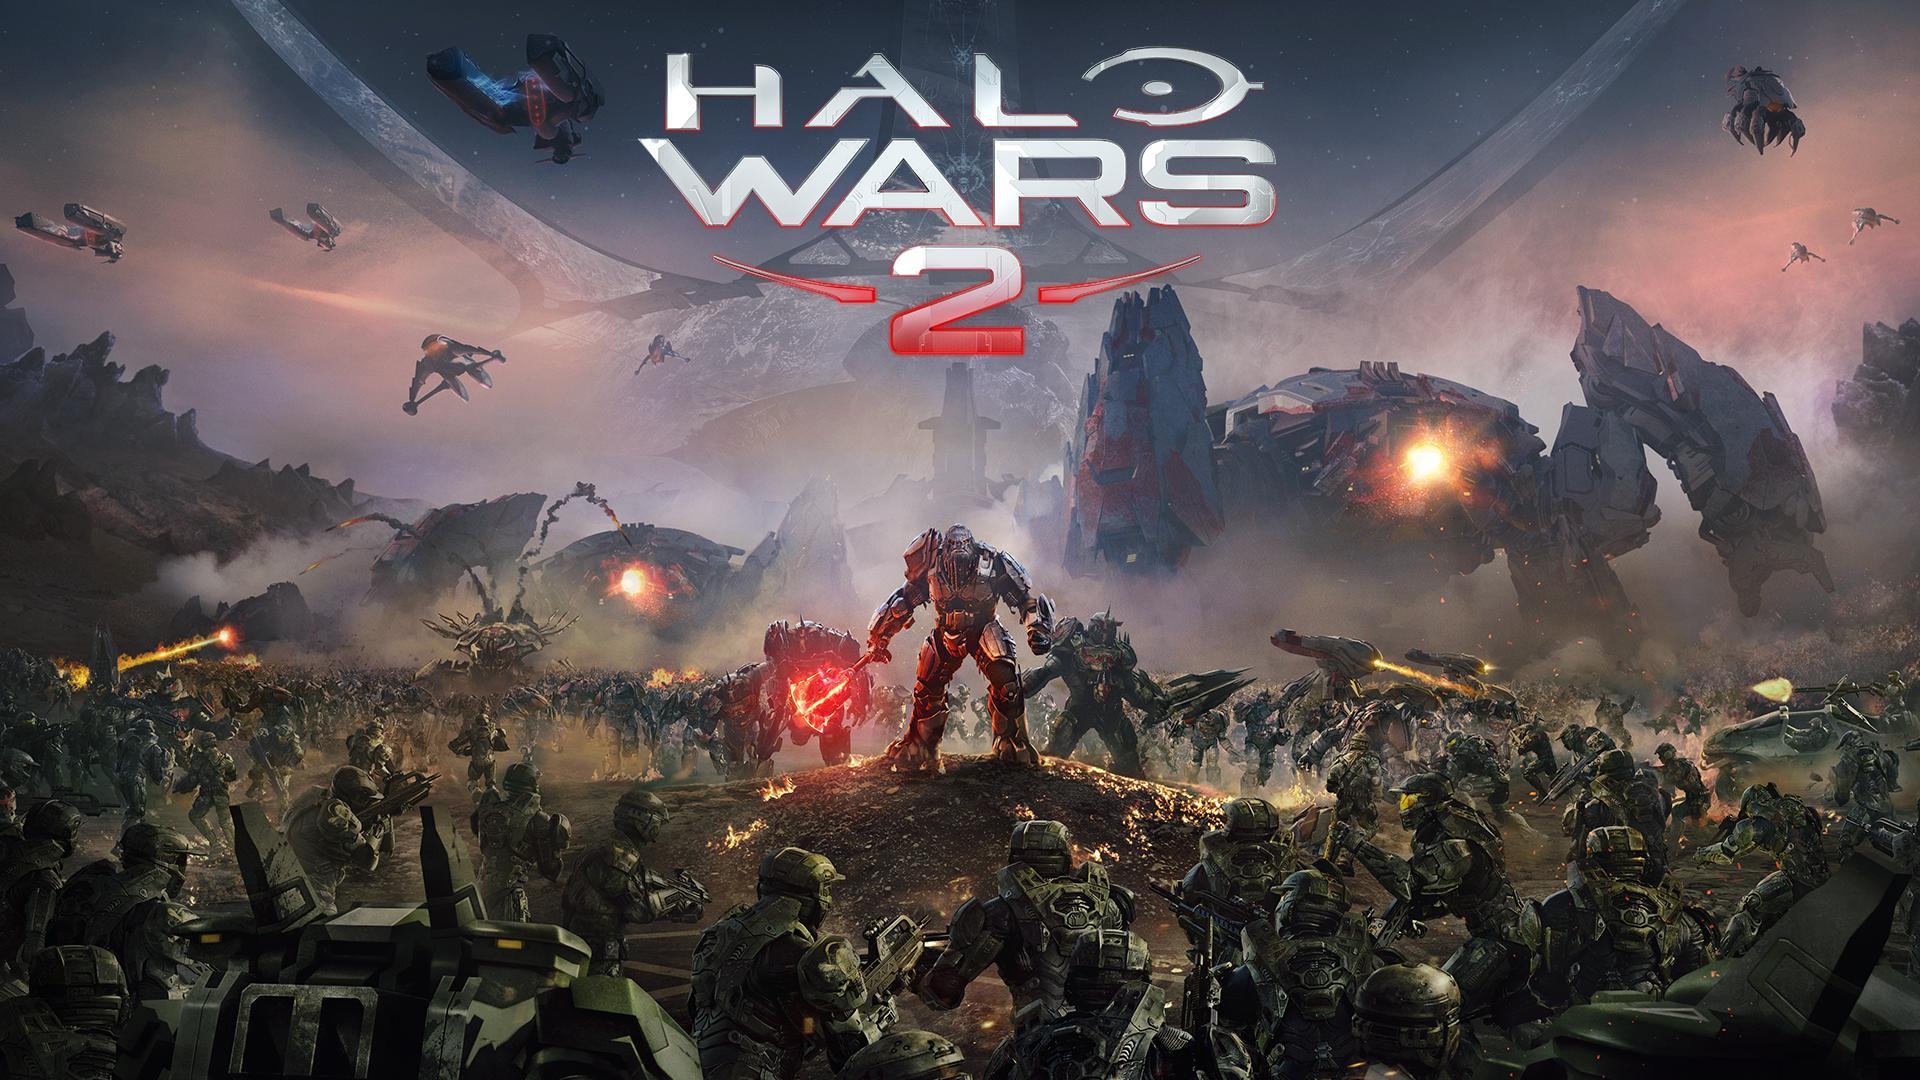 halo-wars-banner.jpg